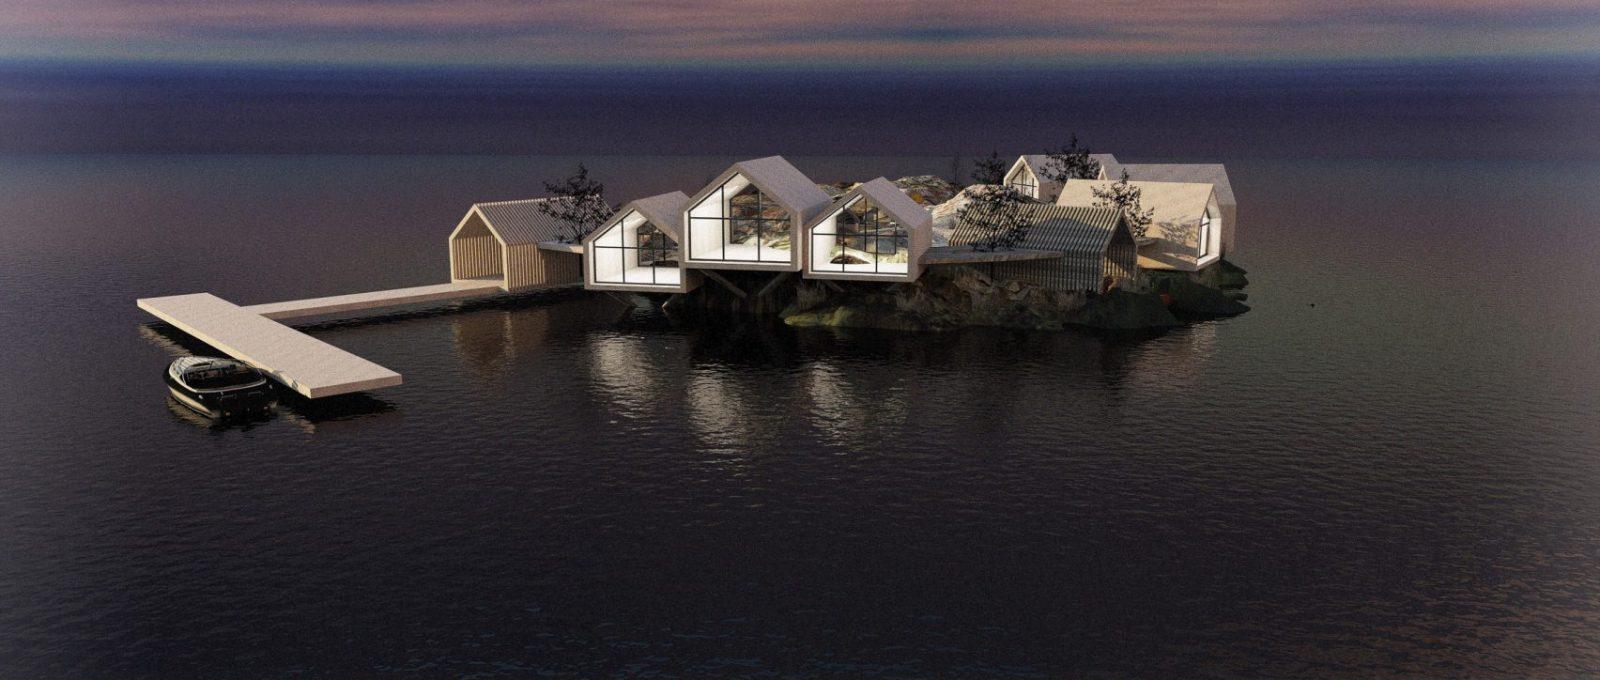 Rat Island, l'eco-resort firmato Jendretzki Design a New York